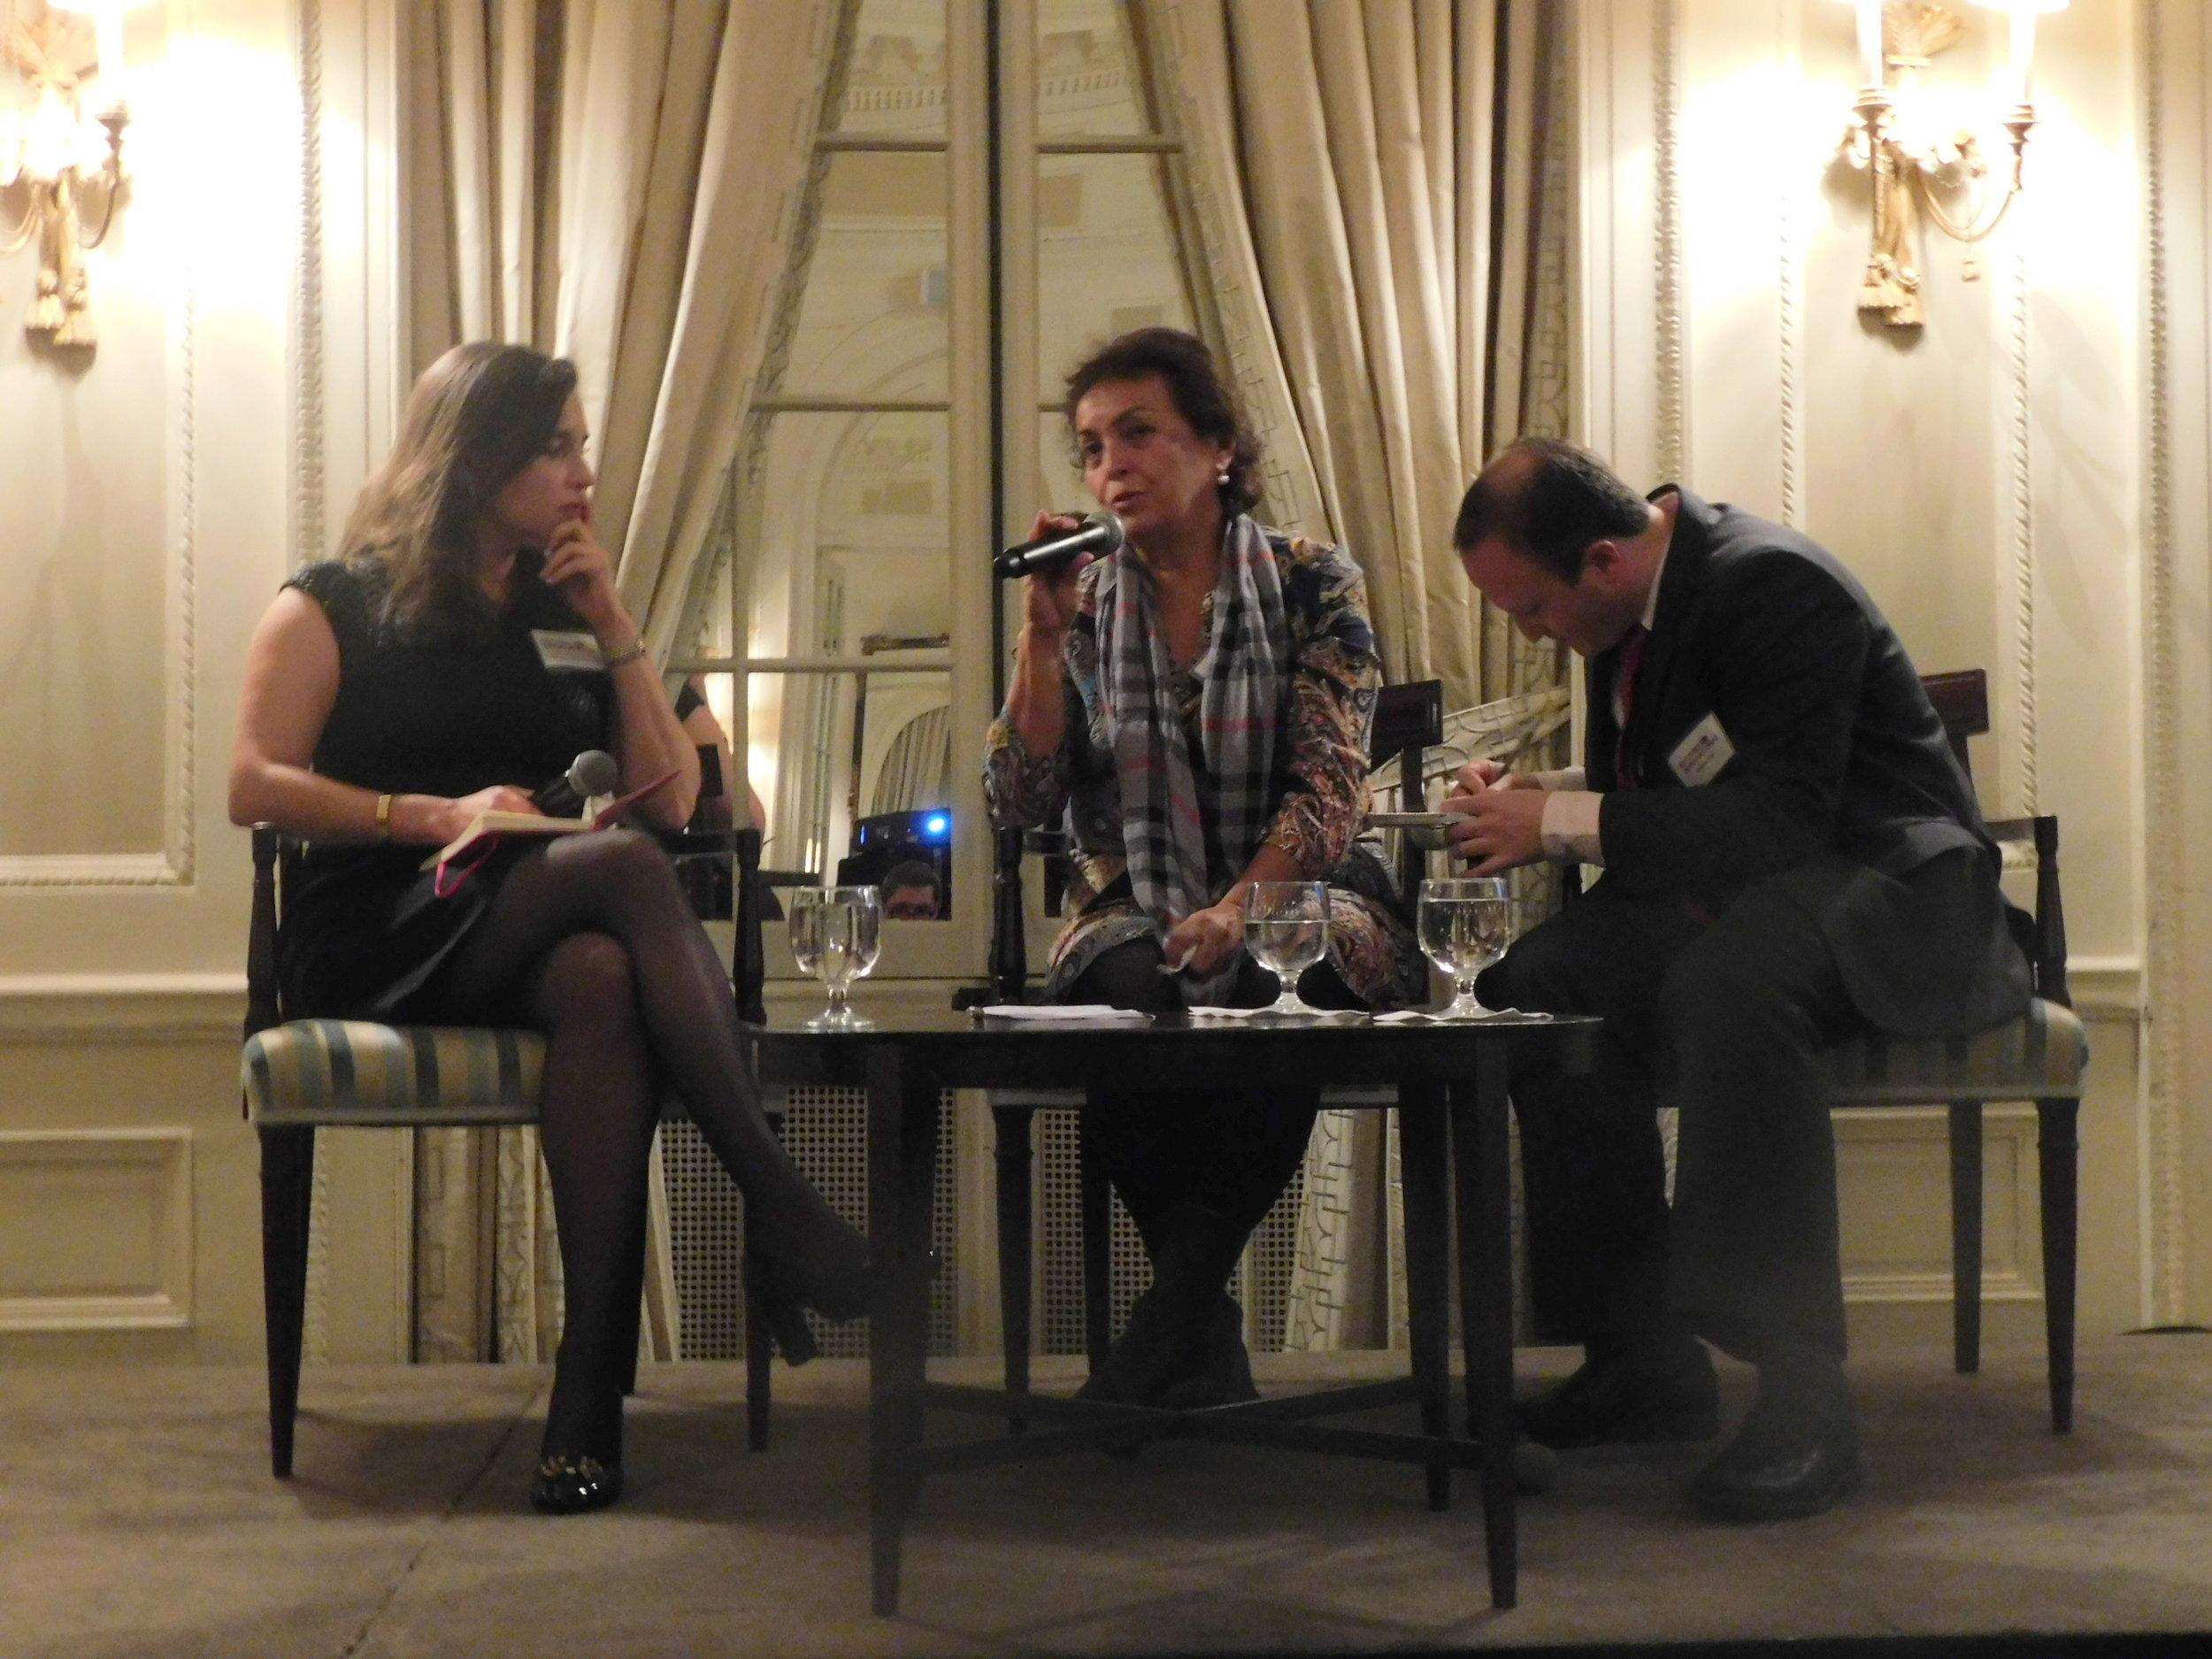 RI Senior Advocate Francisca Vigaud Walsh, Fatima Muriel de Florez, and translator Andrew Roth.